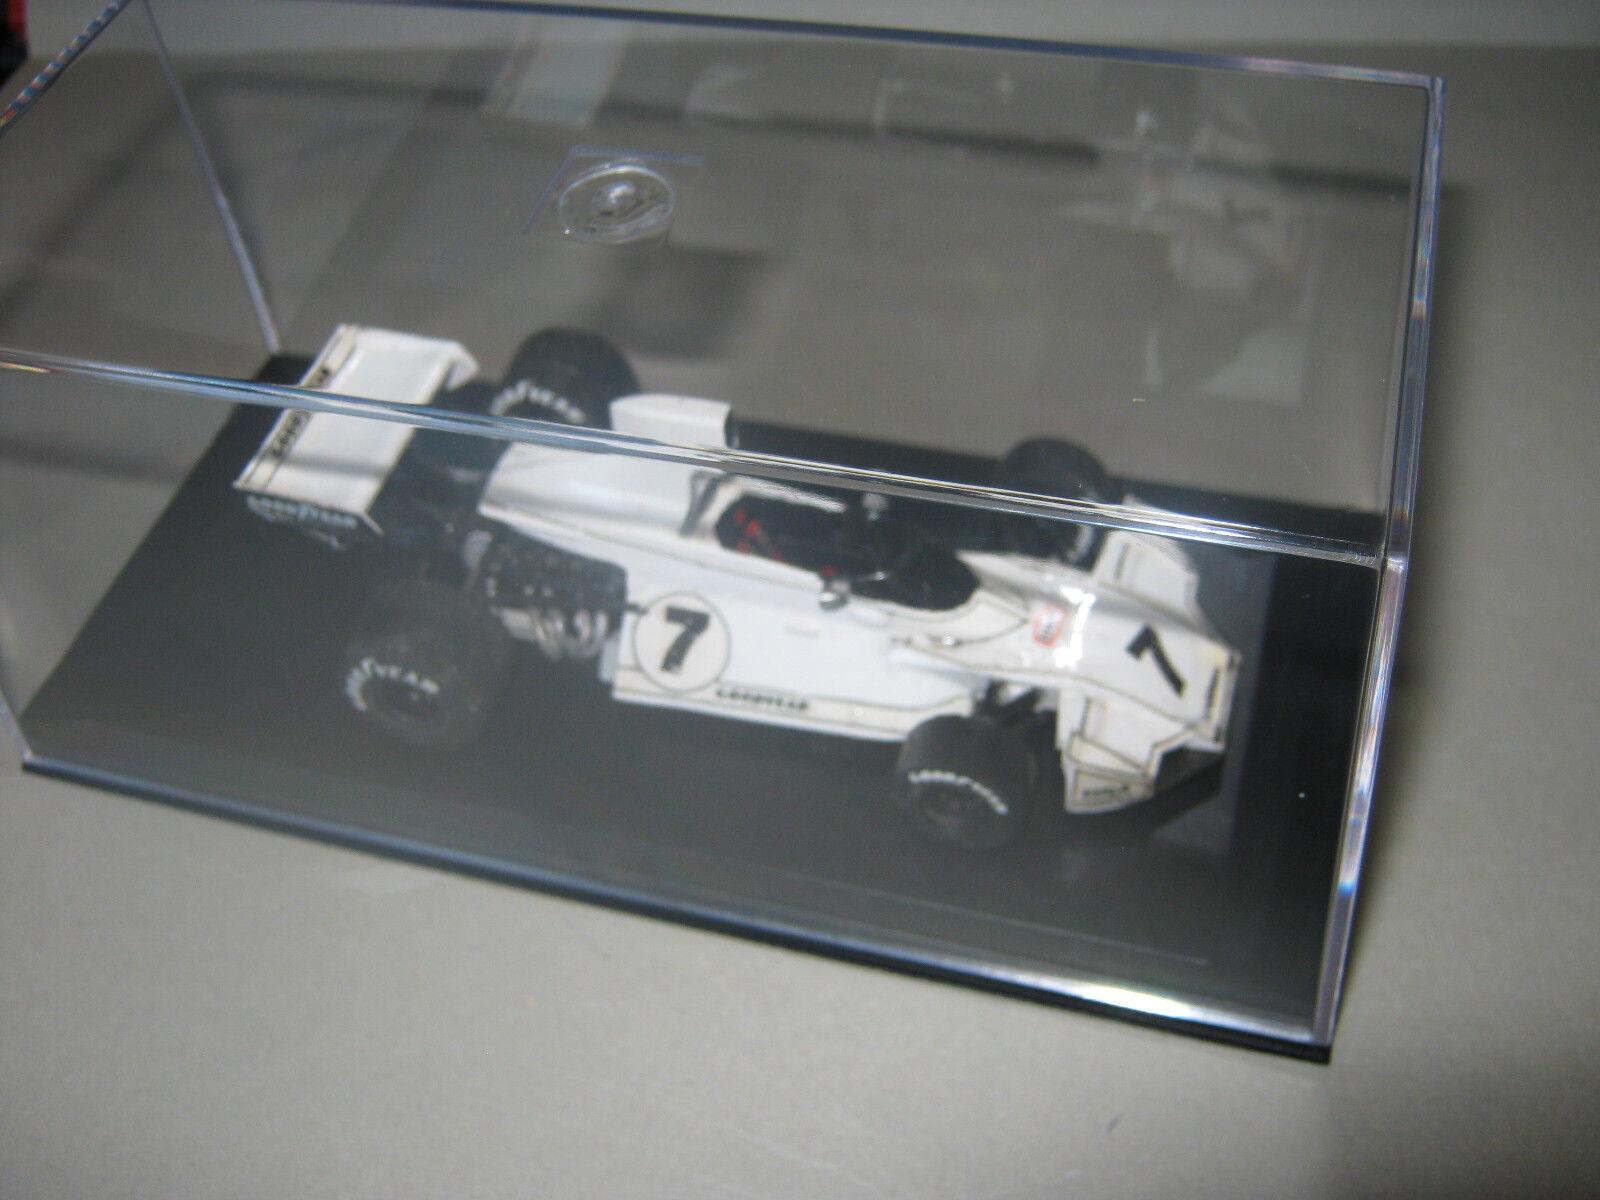 1 43 Brabham Ford BT44 C. C. C. Reutemann Monaco GP 1974 Tenariv handbuilt modelcar 6d65fb